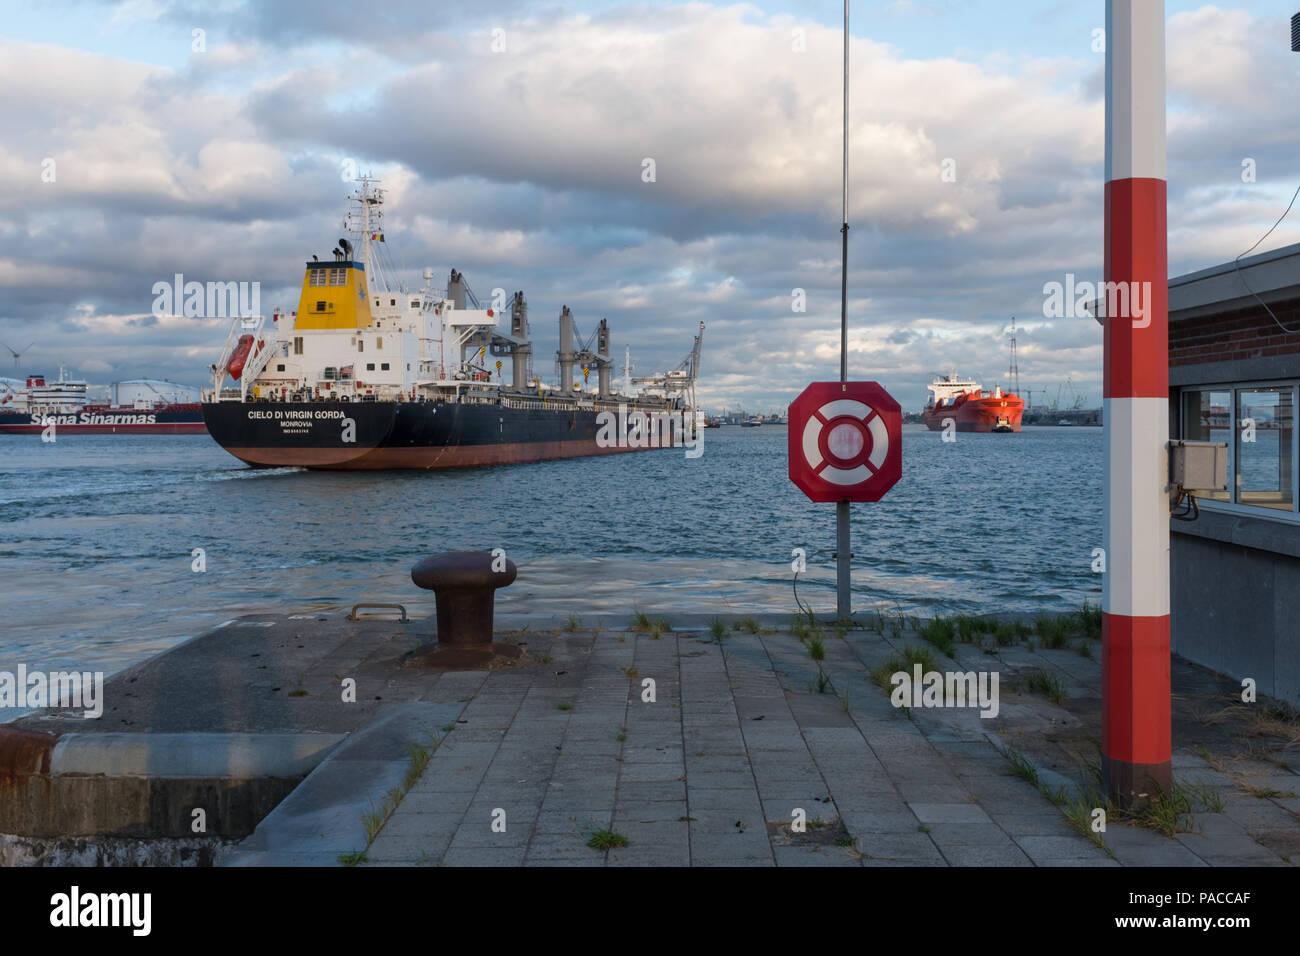 Bulk Carrier sailing out of the lock 'Boudewijnsluis', in the port of Antwerp, Belgium. - Stock Image